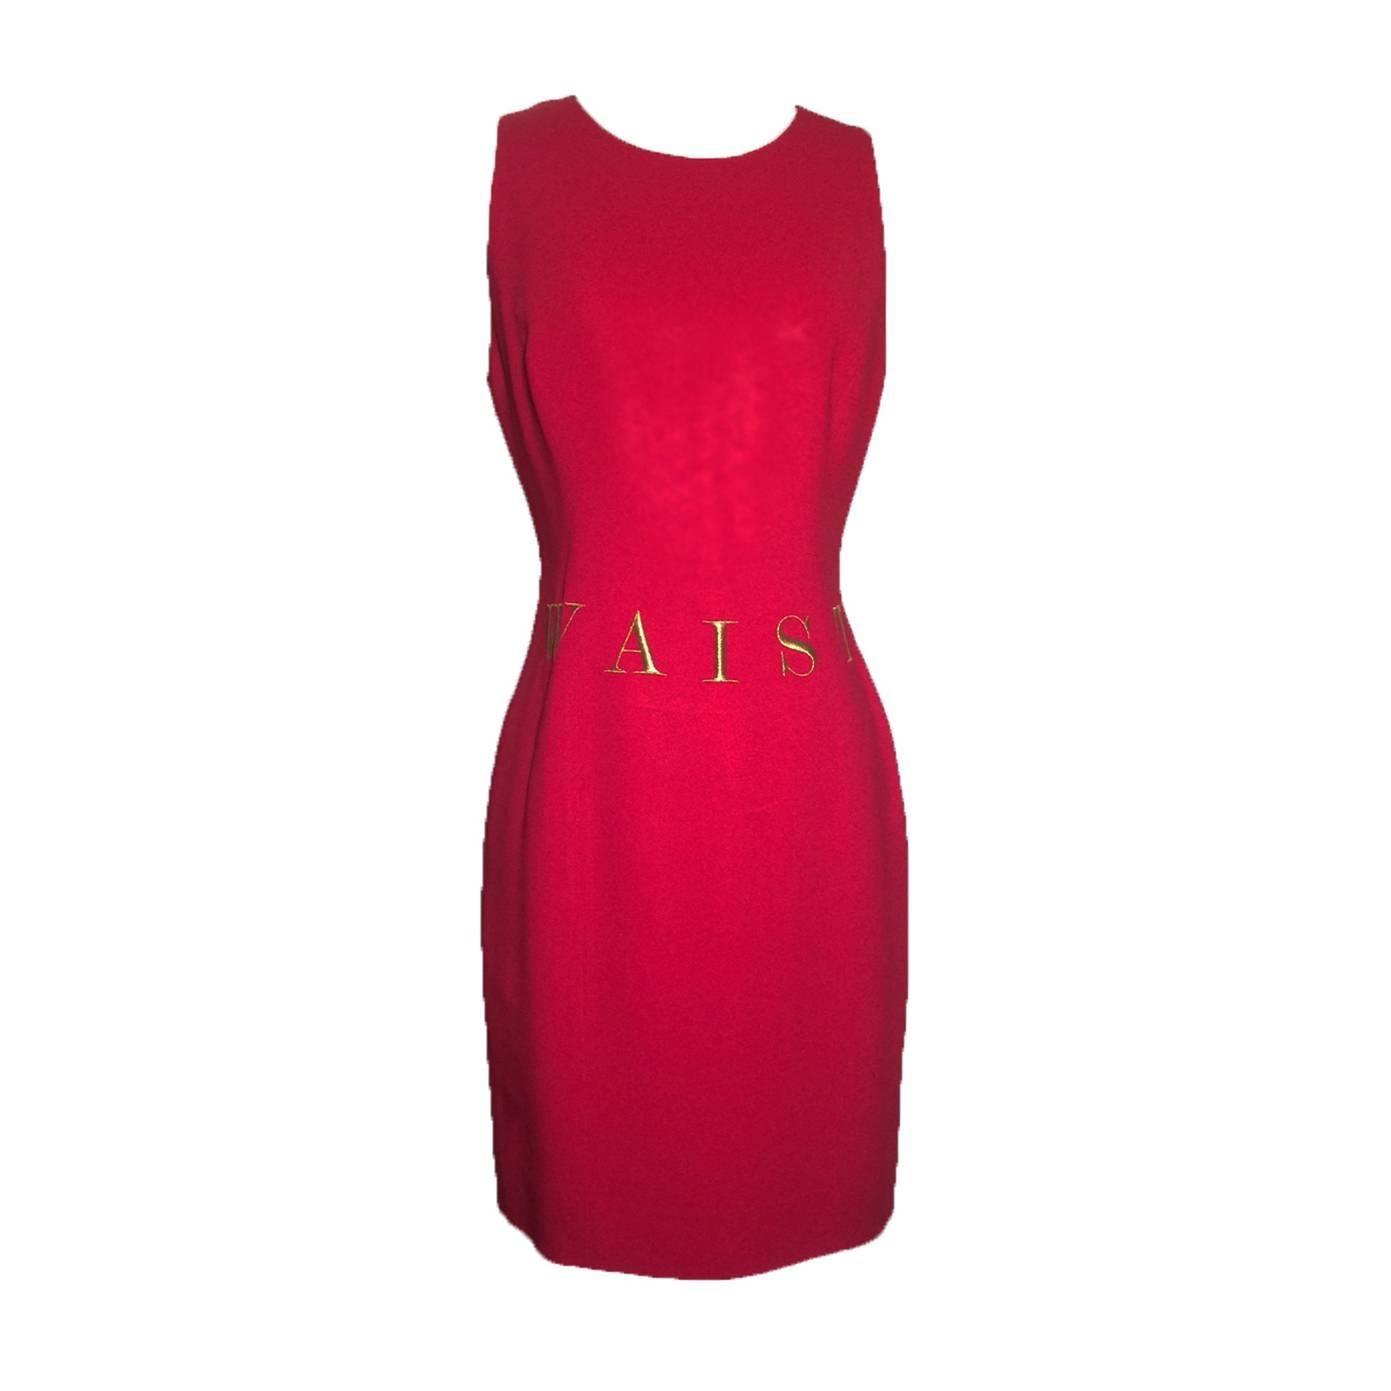 Moschino Couture Waist of Money Red Sleeveless Shift Dress, 1991